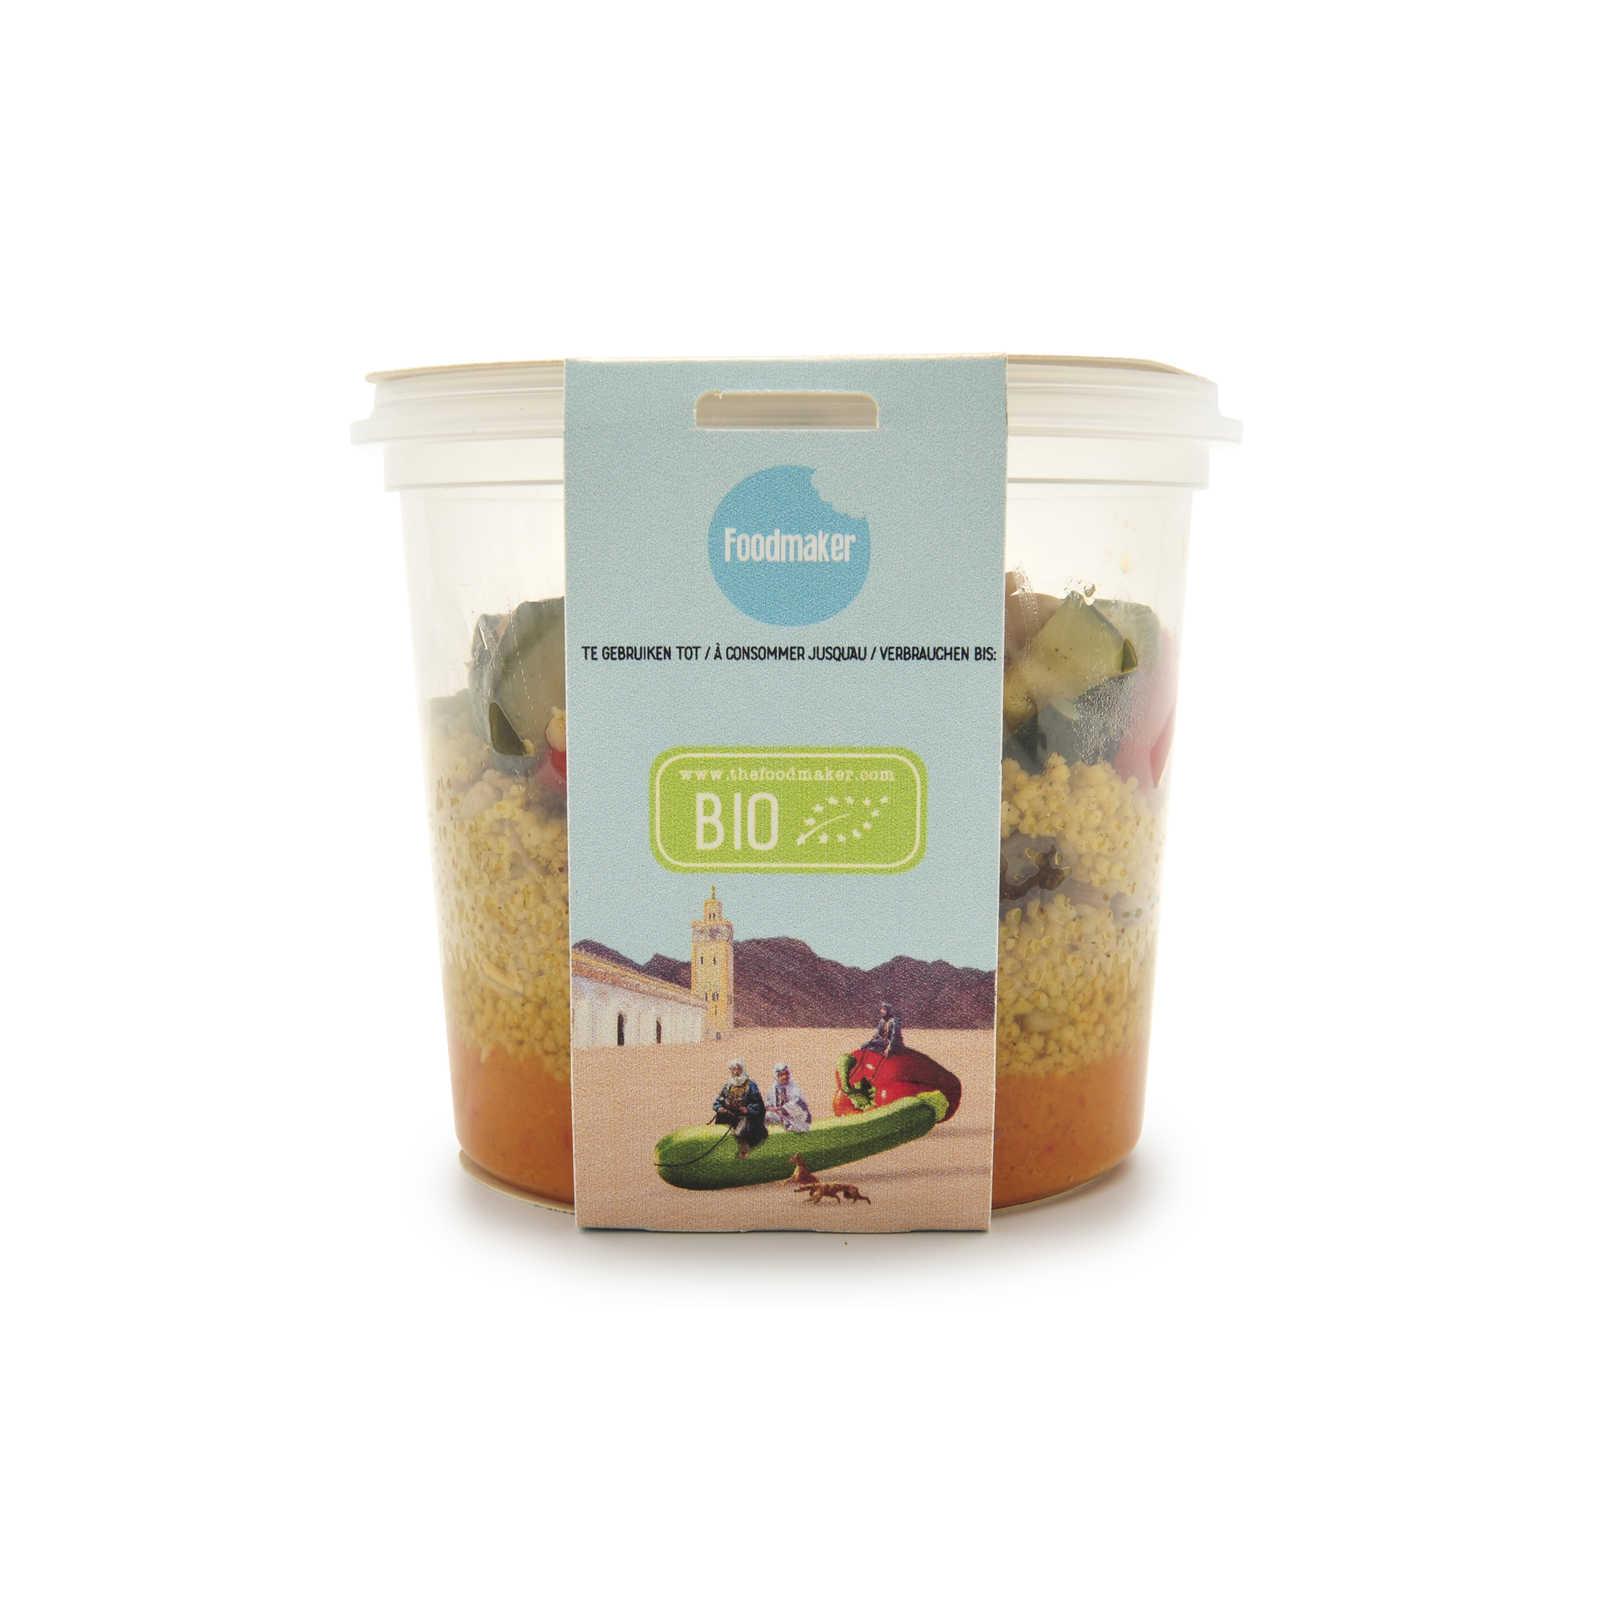 Foodmaker-Bio